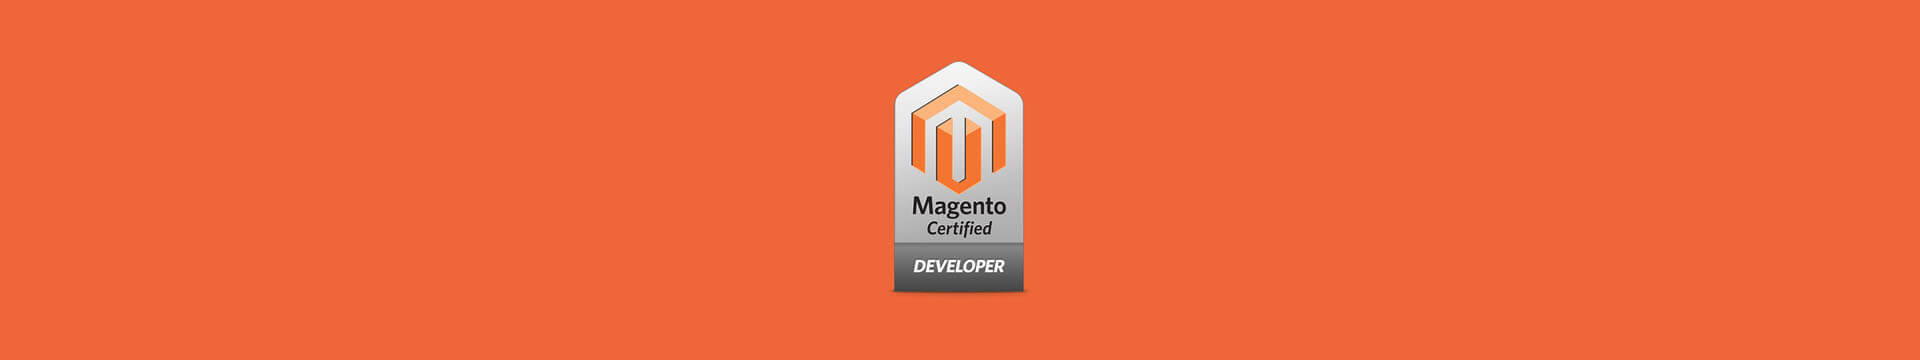 A New Magento Certification at Fluid Digital